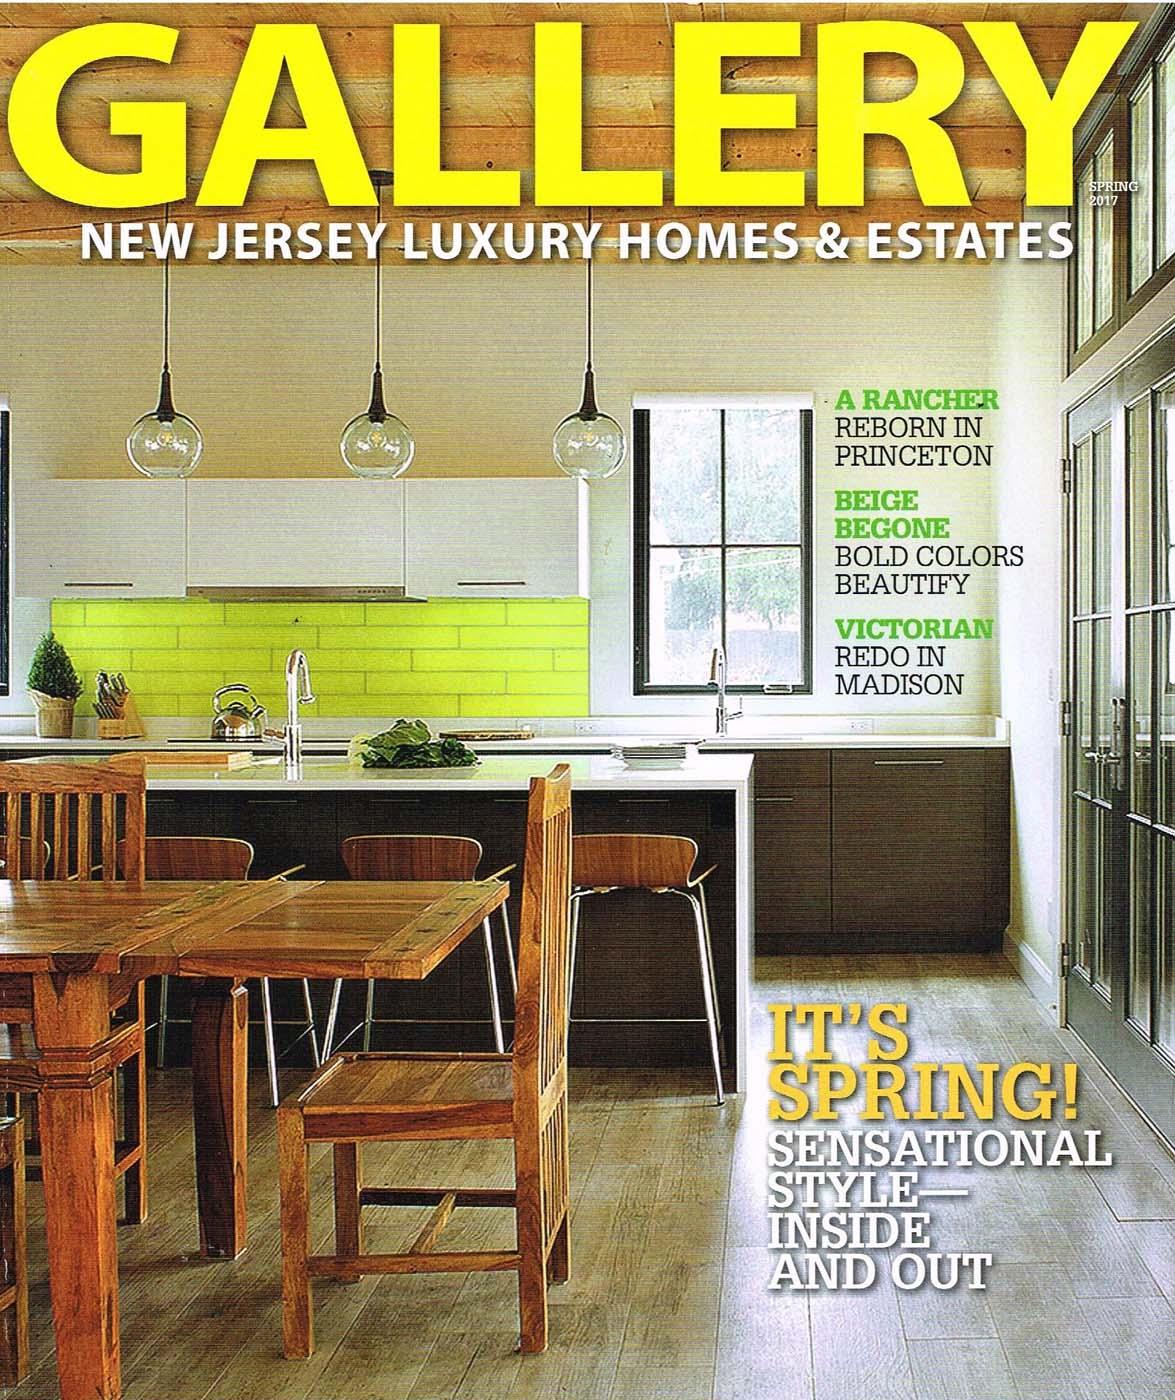 Gallery Cover.jpg